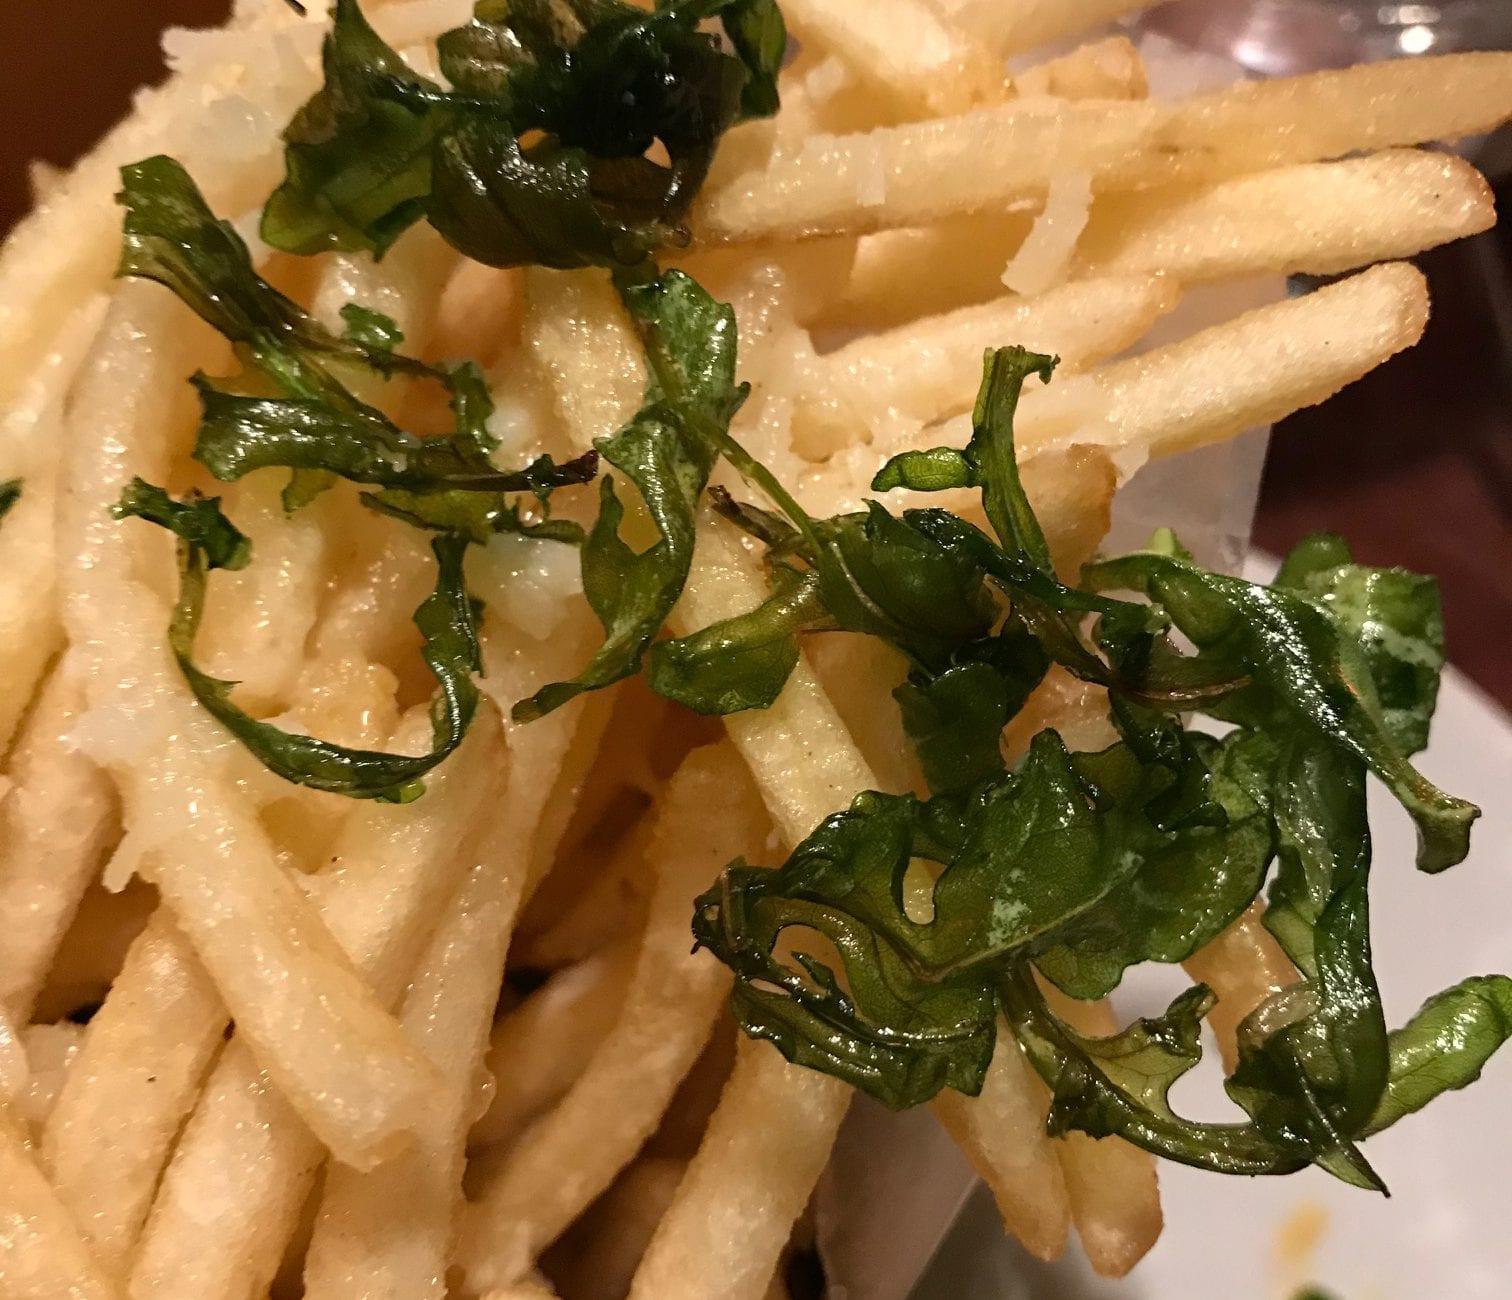 Frugal Foodie Burger Night At Atria Restaurant: Truffle Fries Brick Cellar Restaurant Burger Night Edgartown Dining